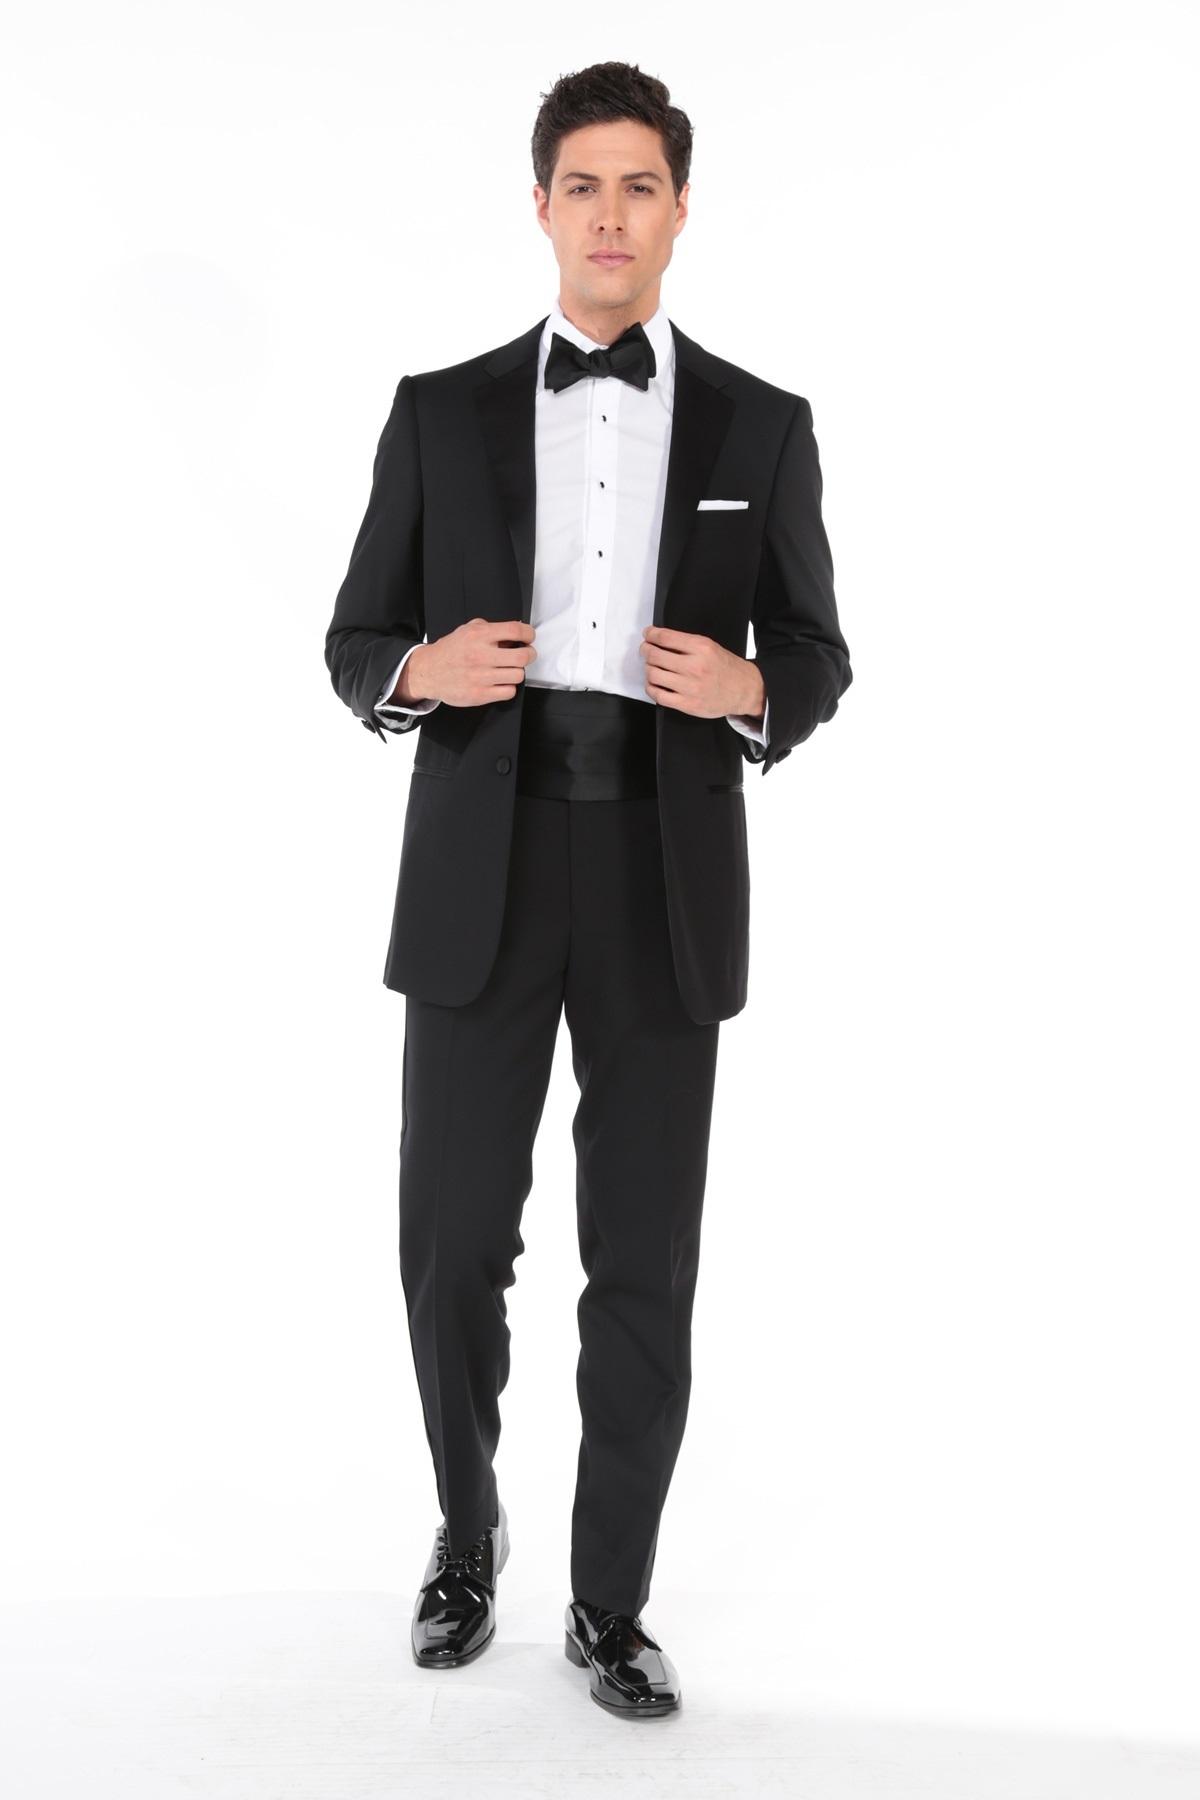 MFWtux.com - Black Tuxedo